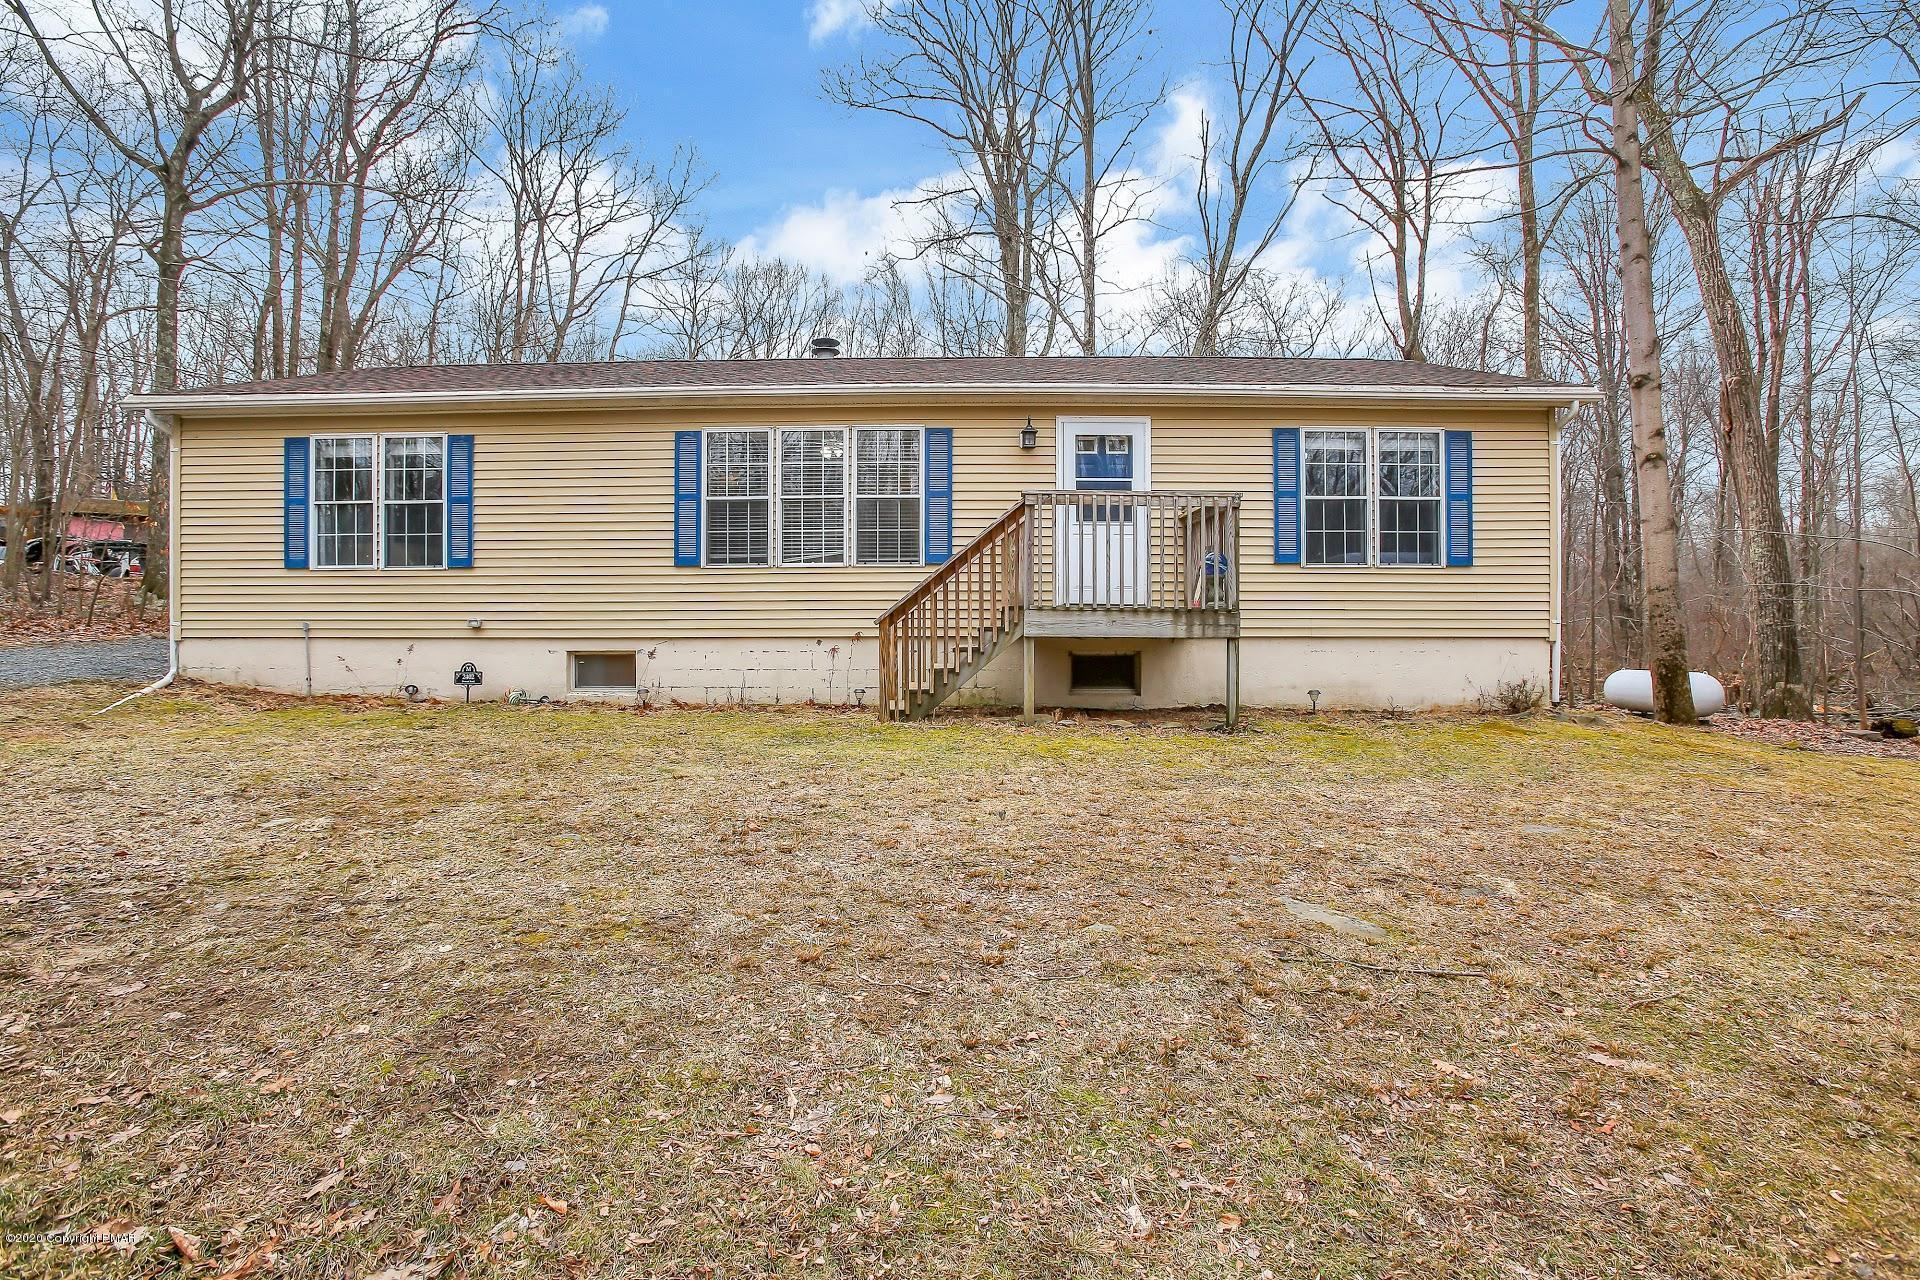 2402 Dornick Rd, East Stroudsburg, PA 18302